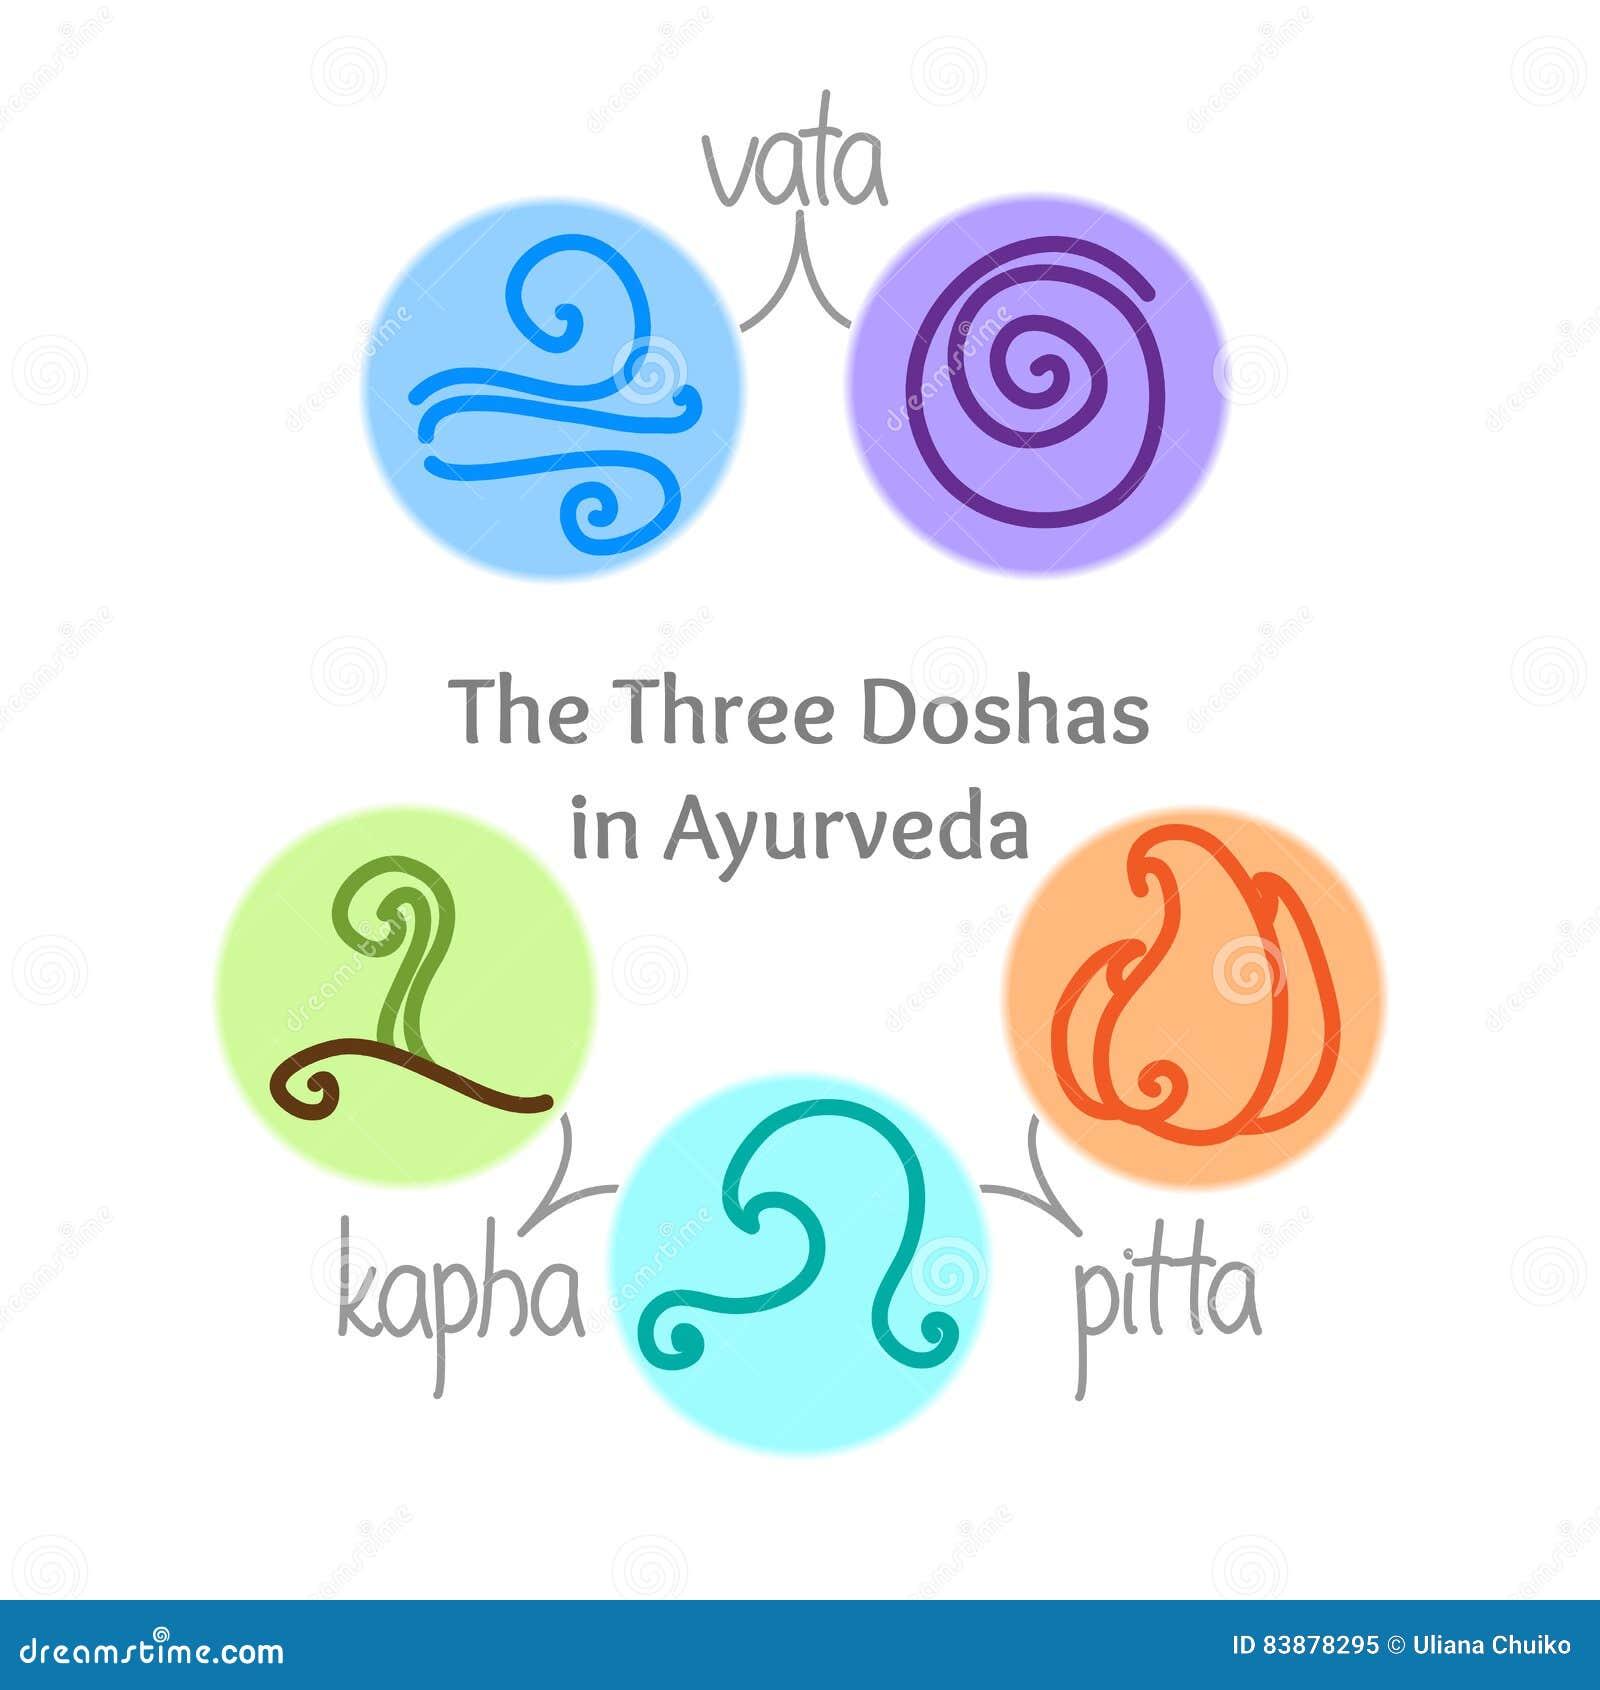 Ayurvedic Elements Symbols And Doshas Stock Vector Illustration Of